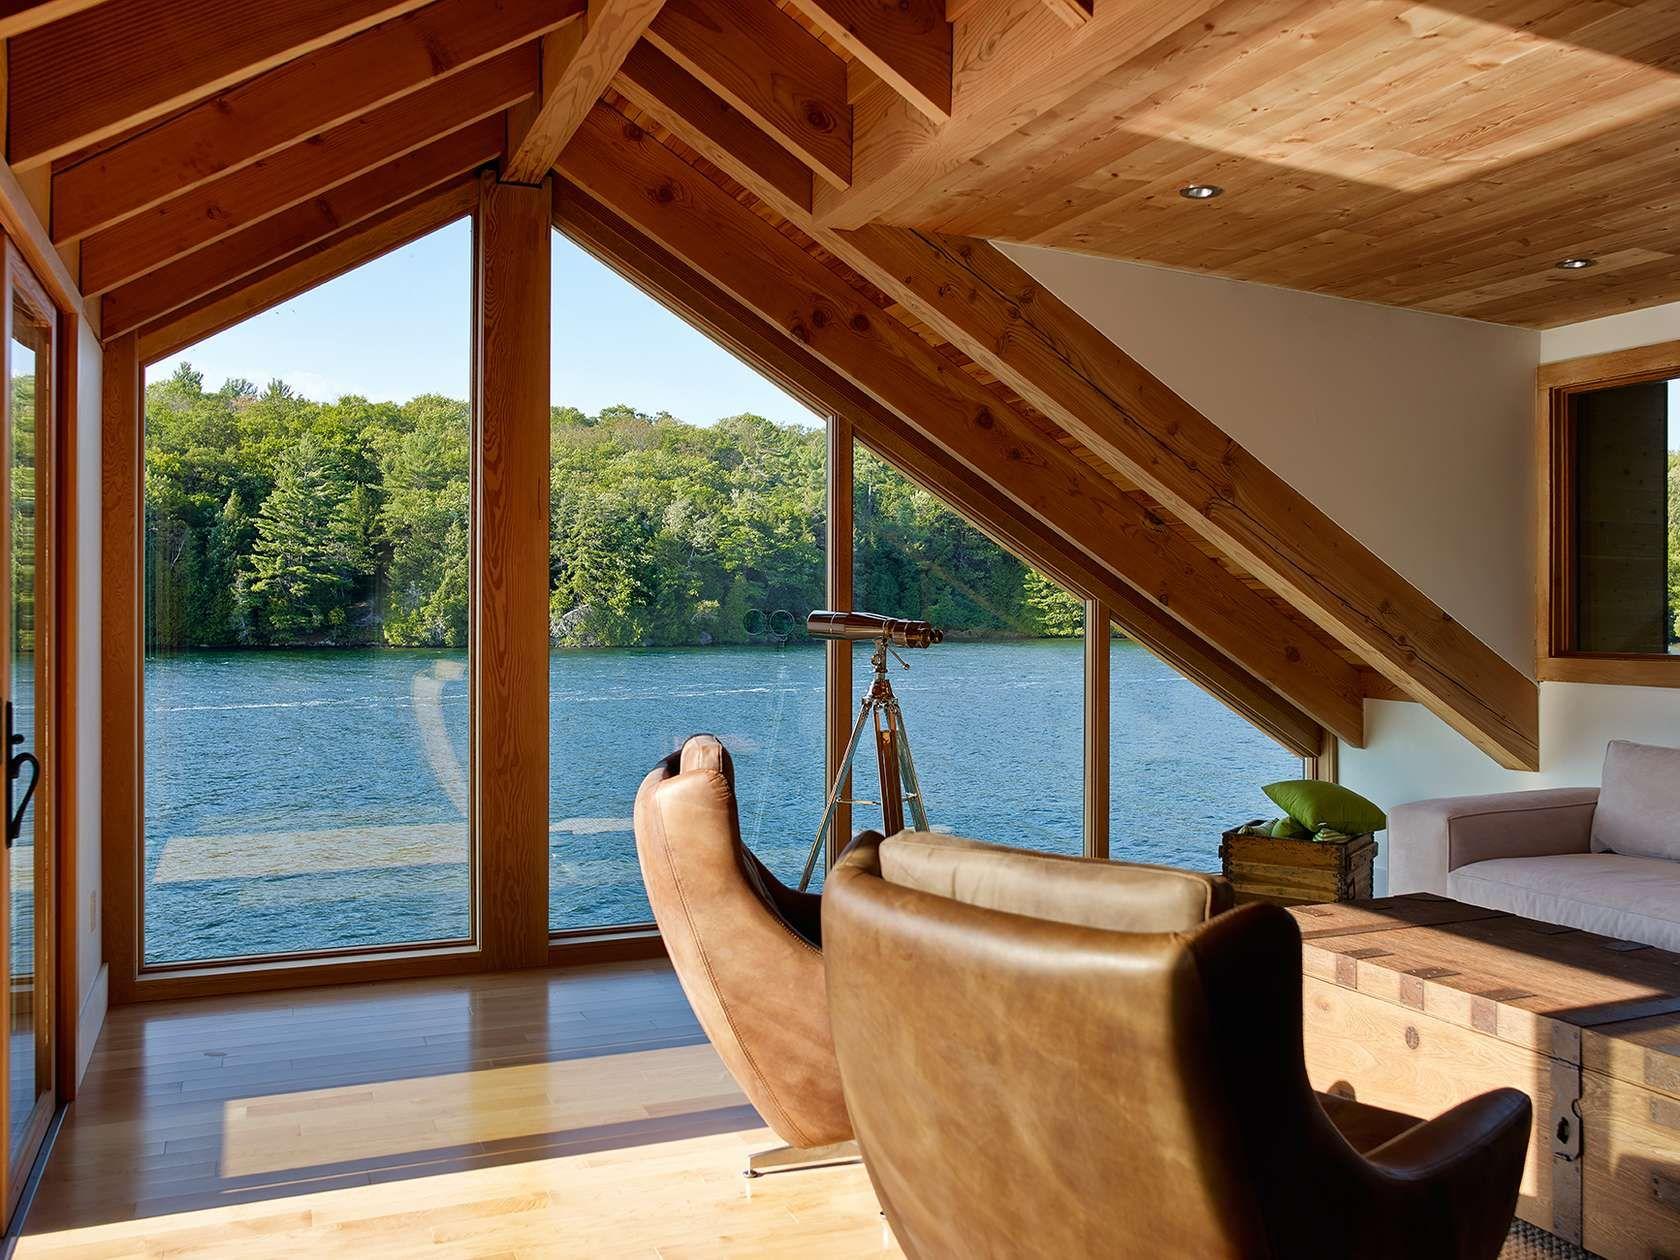 Modern window house design  lake joseph boathouse  architecture  pinterest  architecture